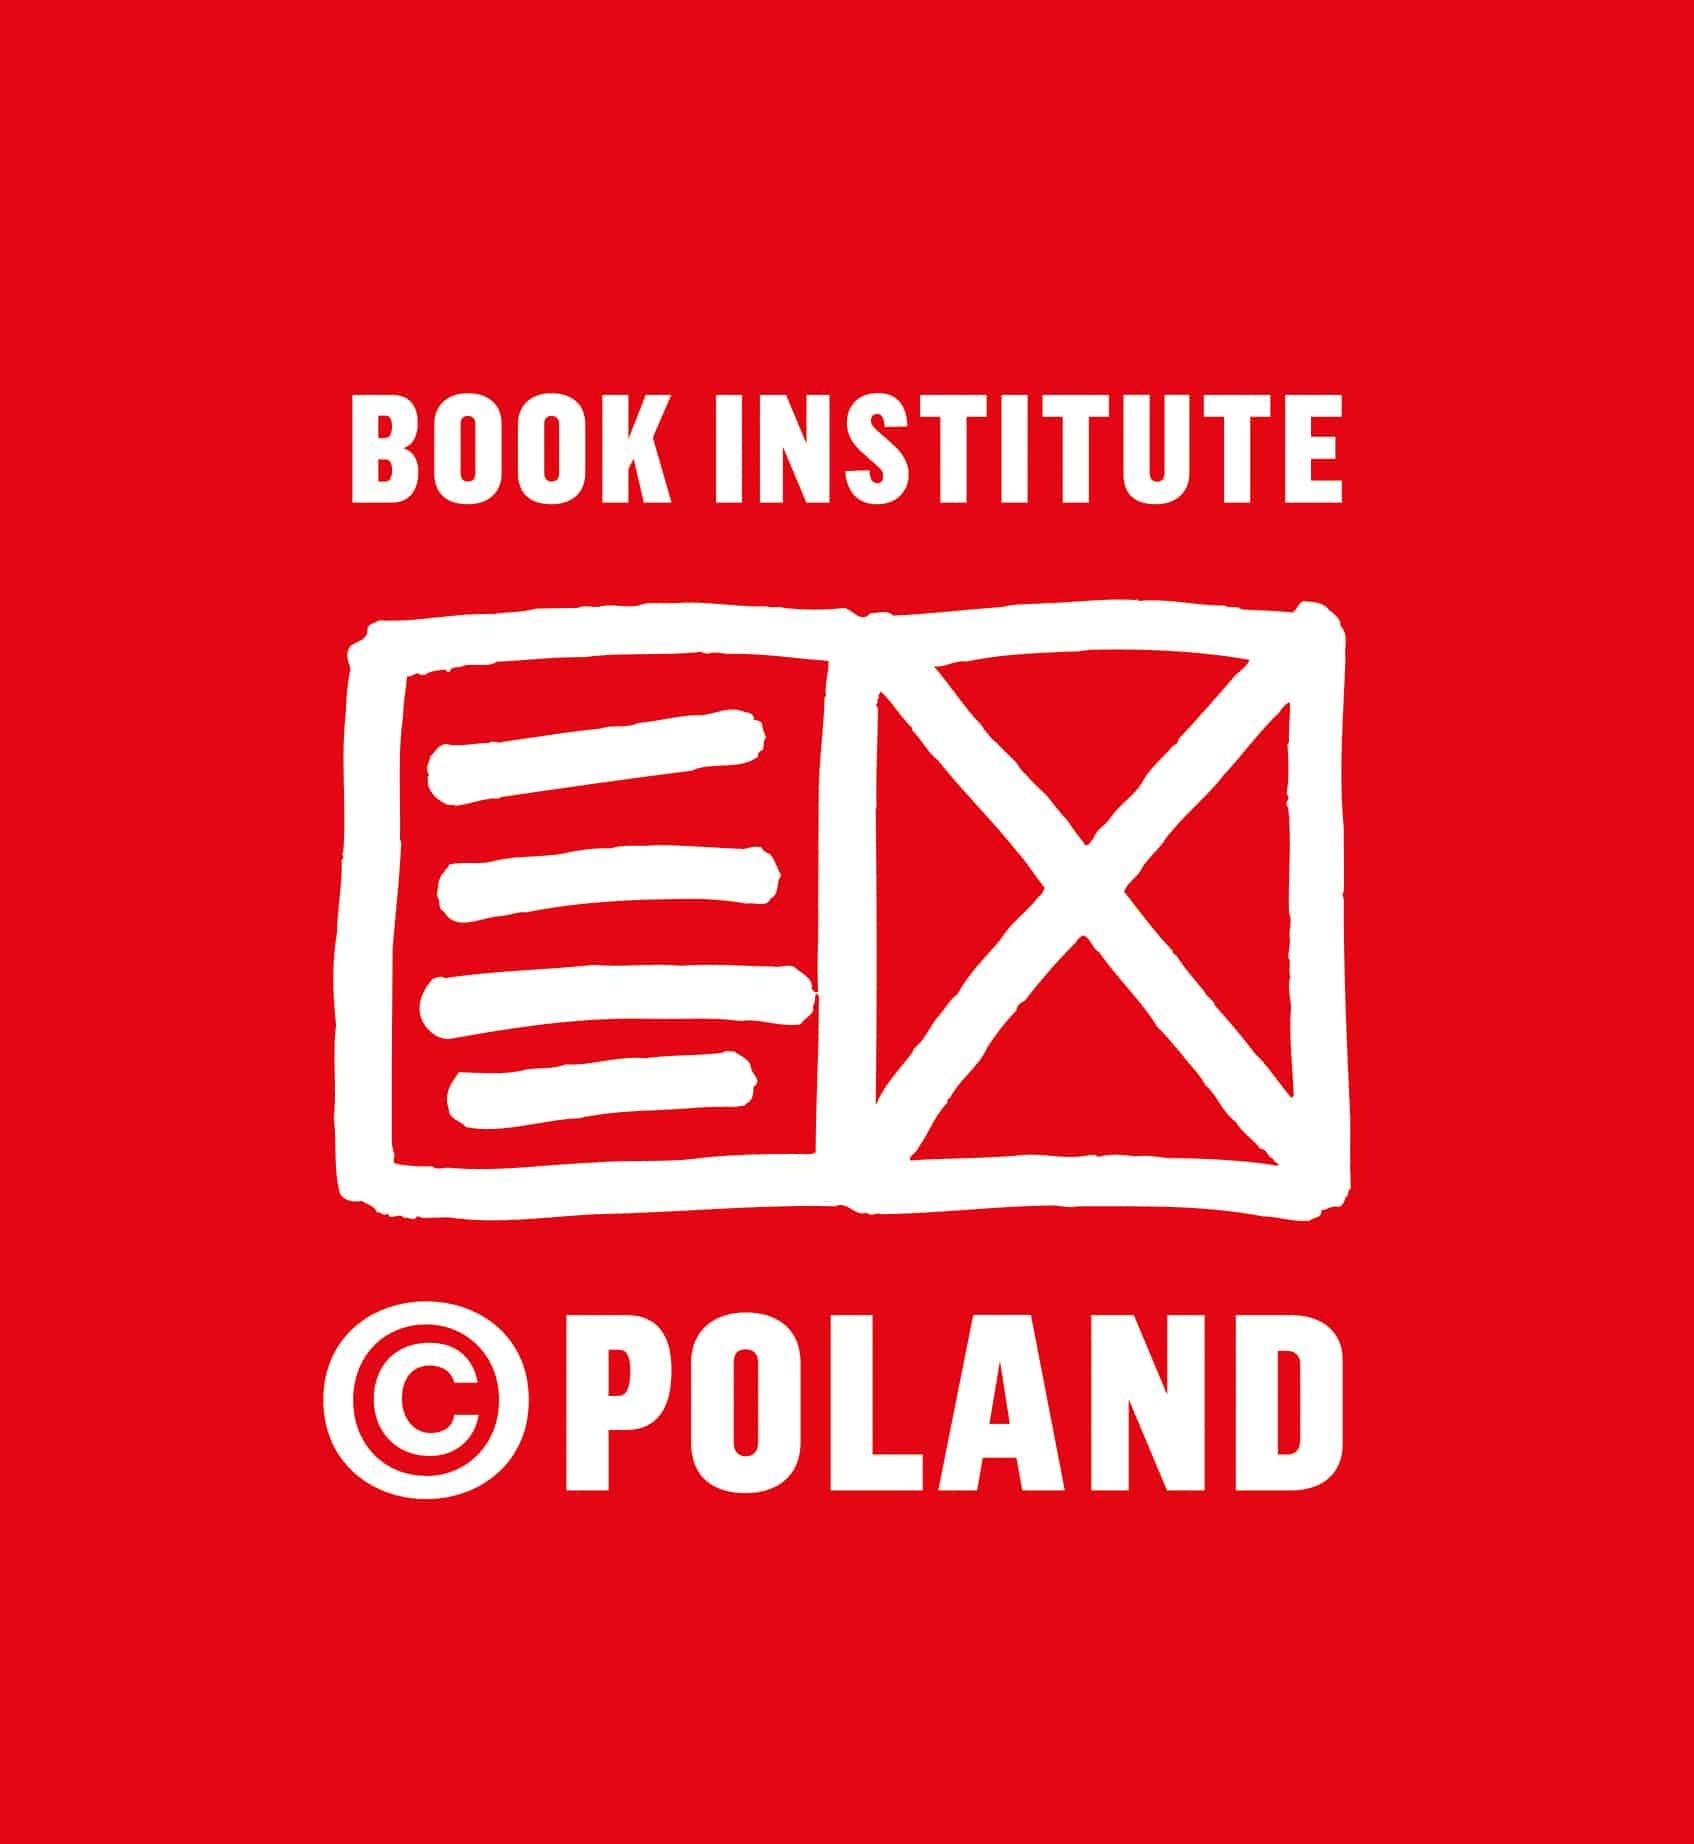 Logotyp Book Institute Poland